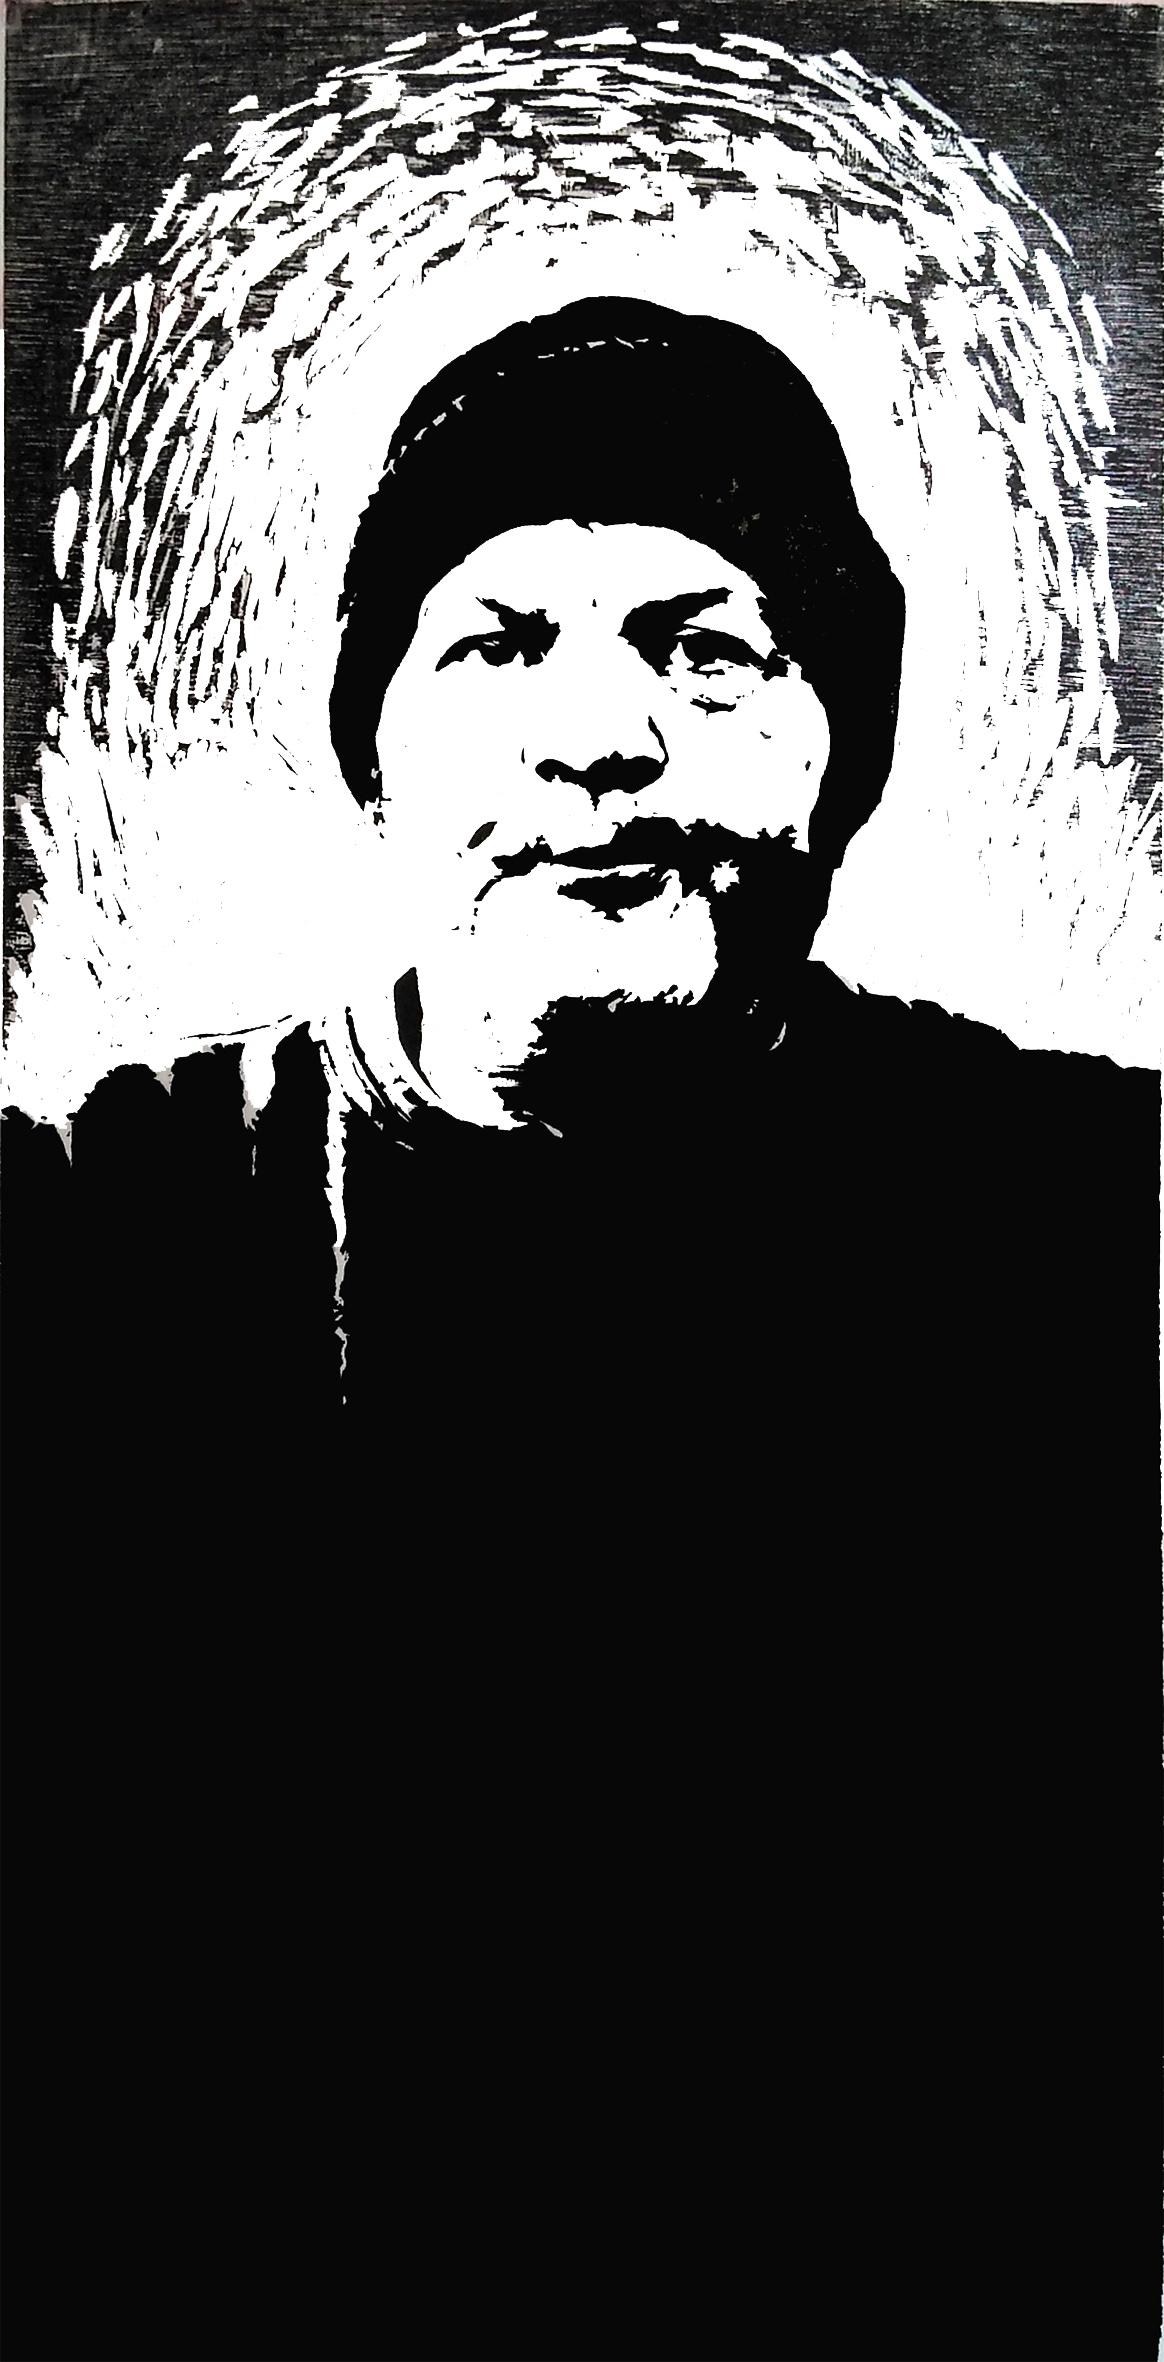 David f, woodcut, 60cm x 120cm, 2020